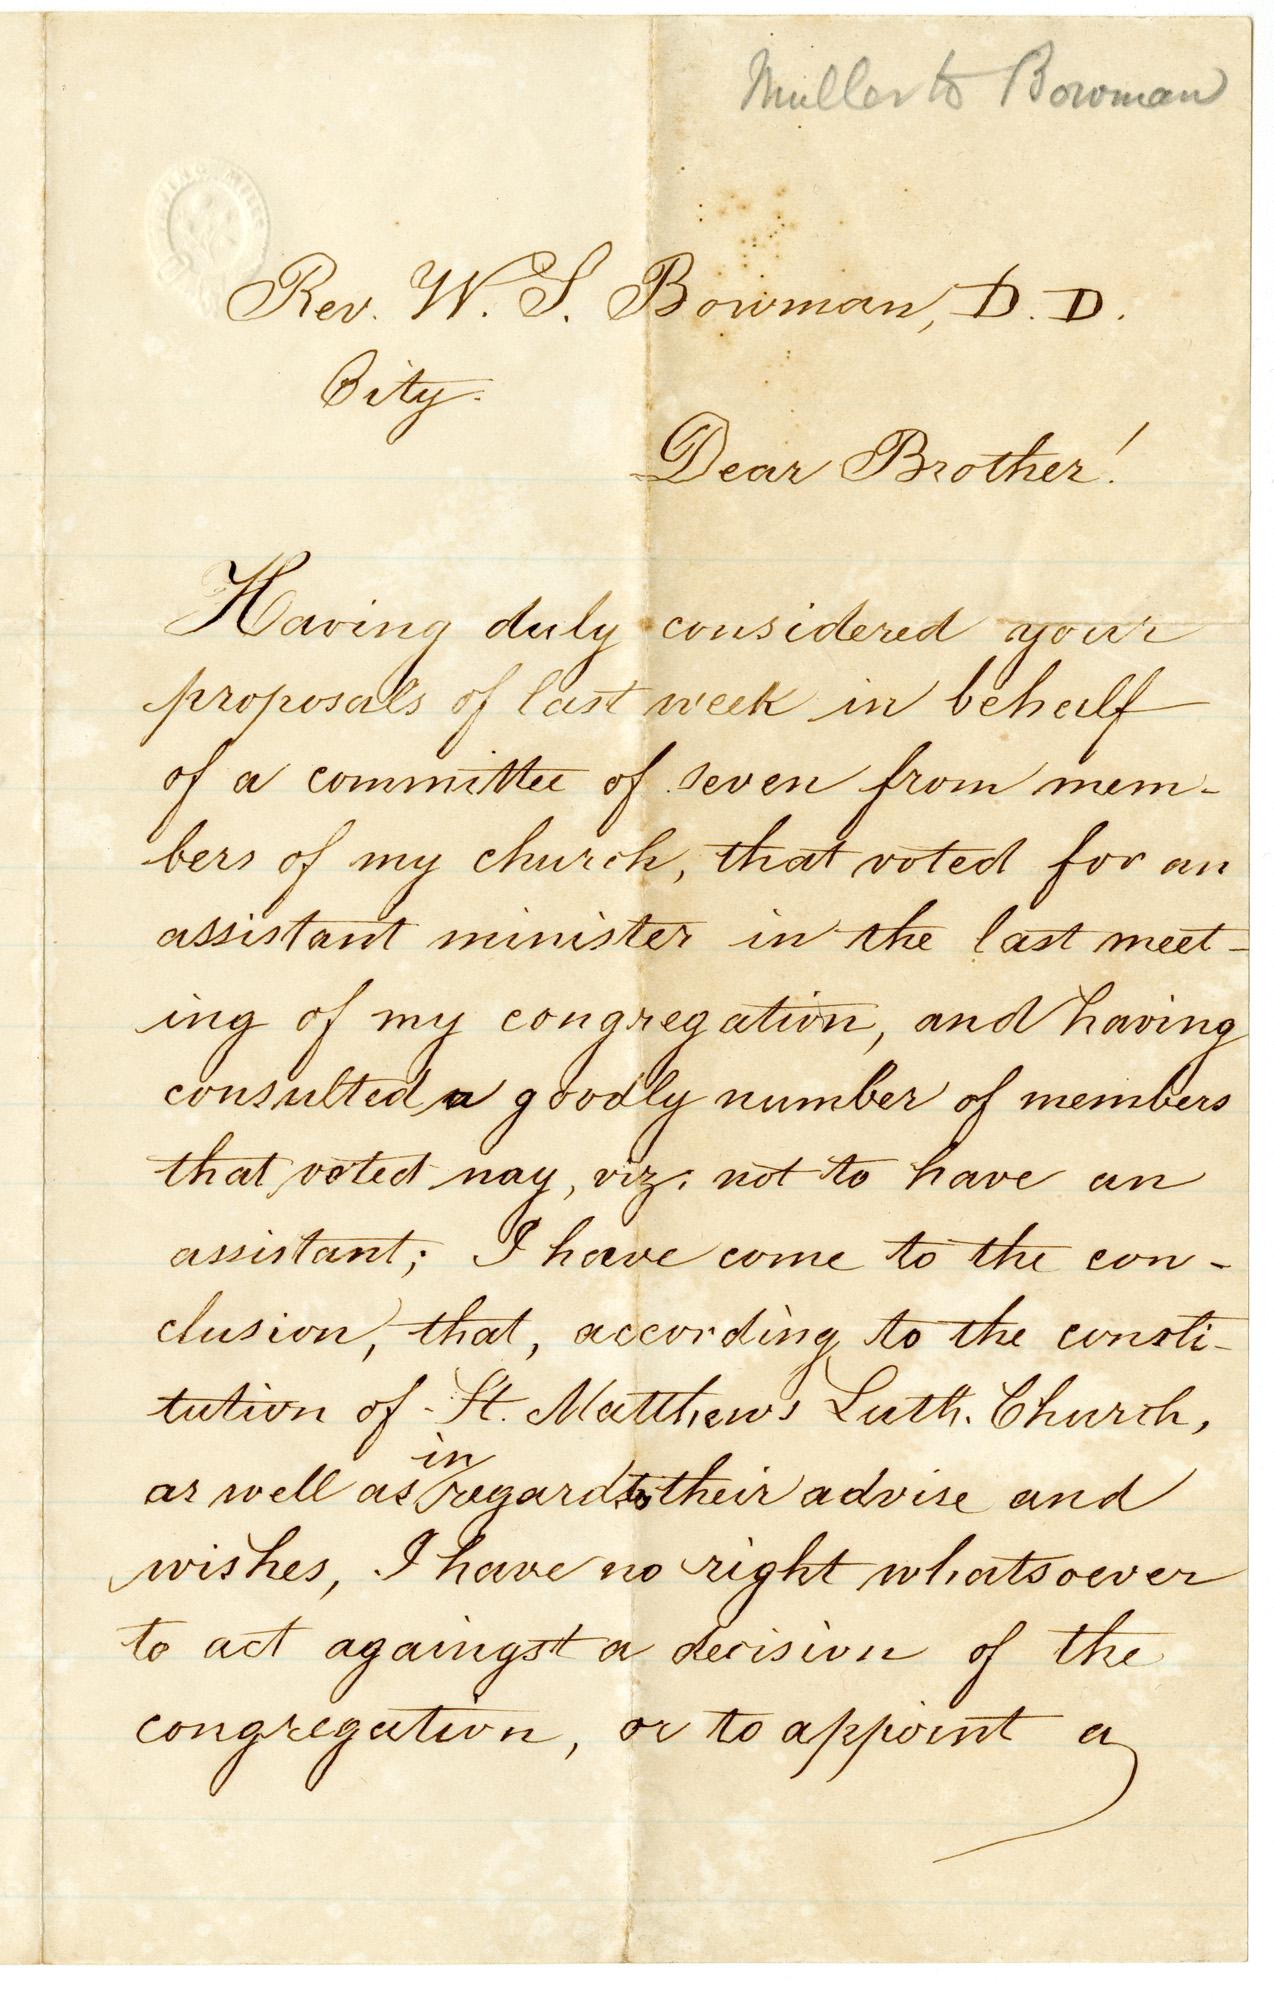 Letter from Pastor Muller to Reverand W. L. Bowman, April 16, 1877